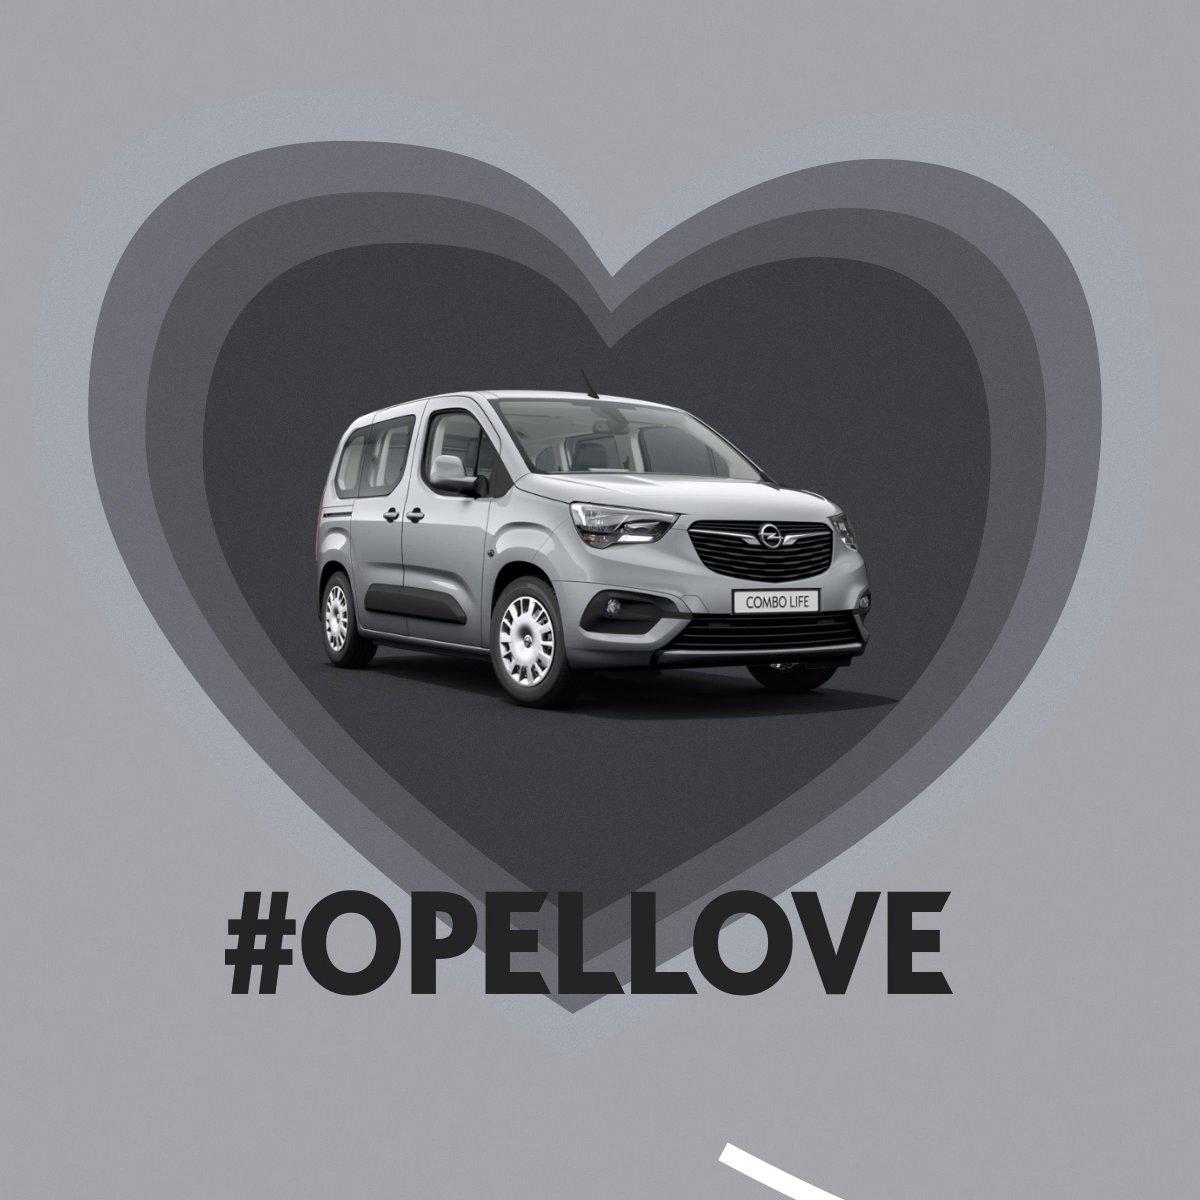 Herzliche Grüße vom #OpelCombo Life 💛 Hier konfigurieren: s.opel.com/l7v38 #OpelLove